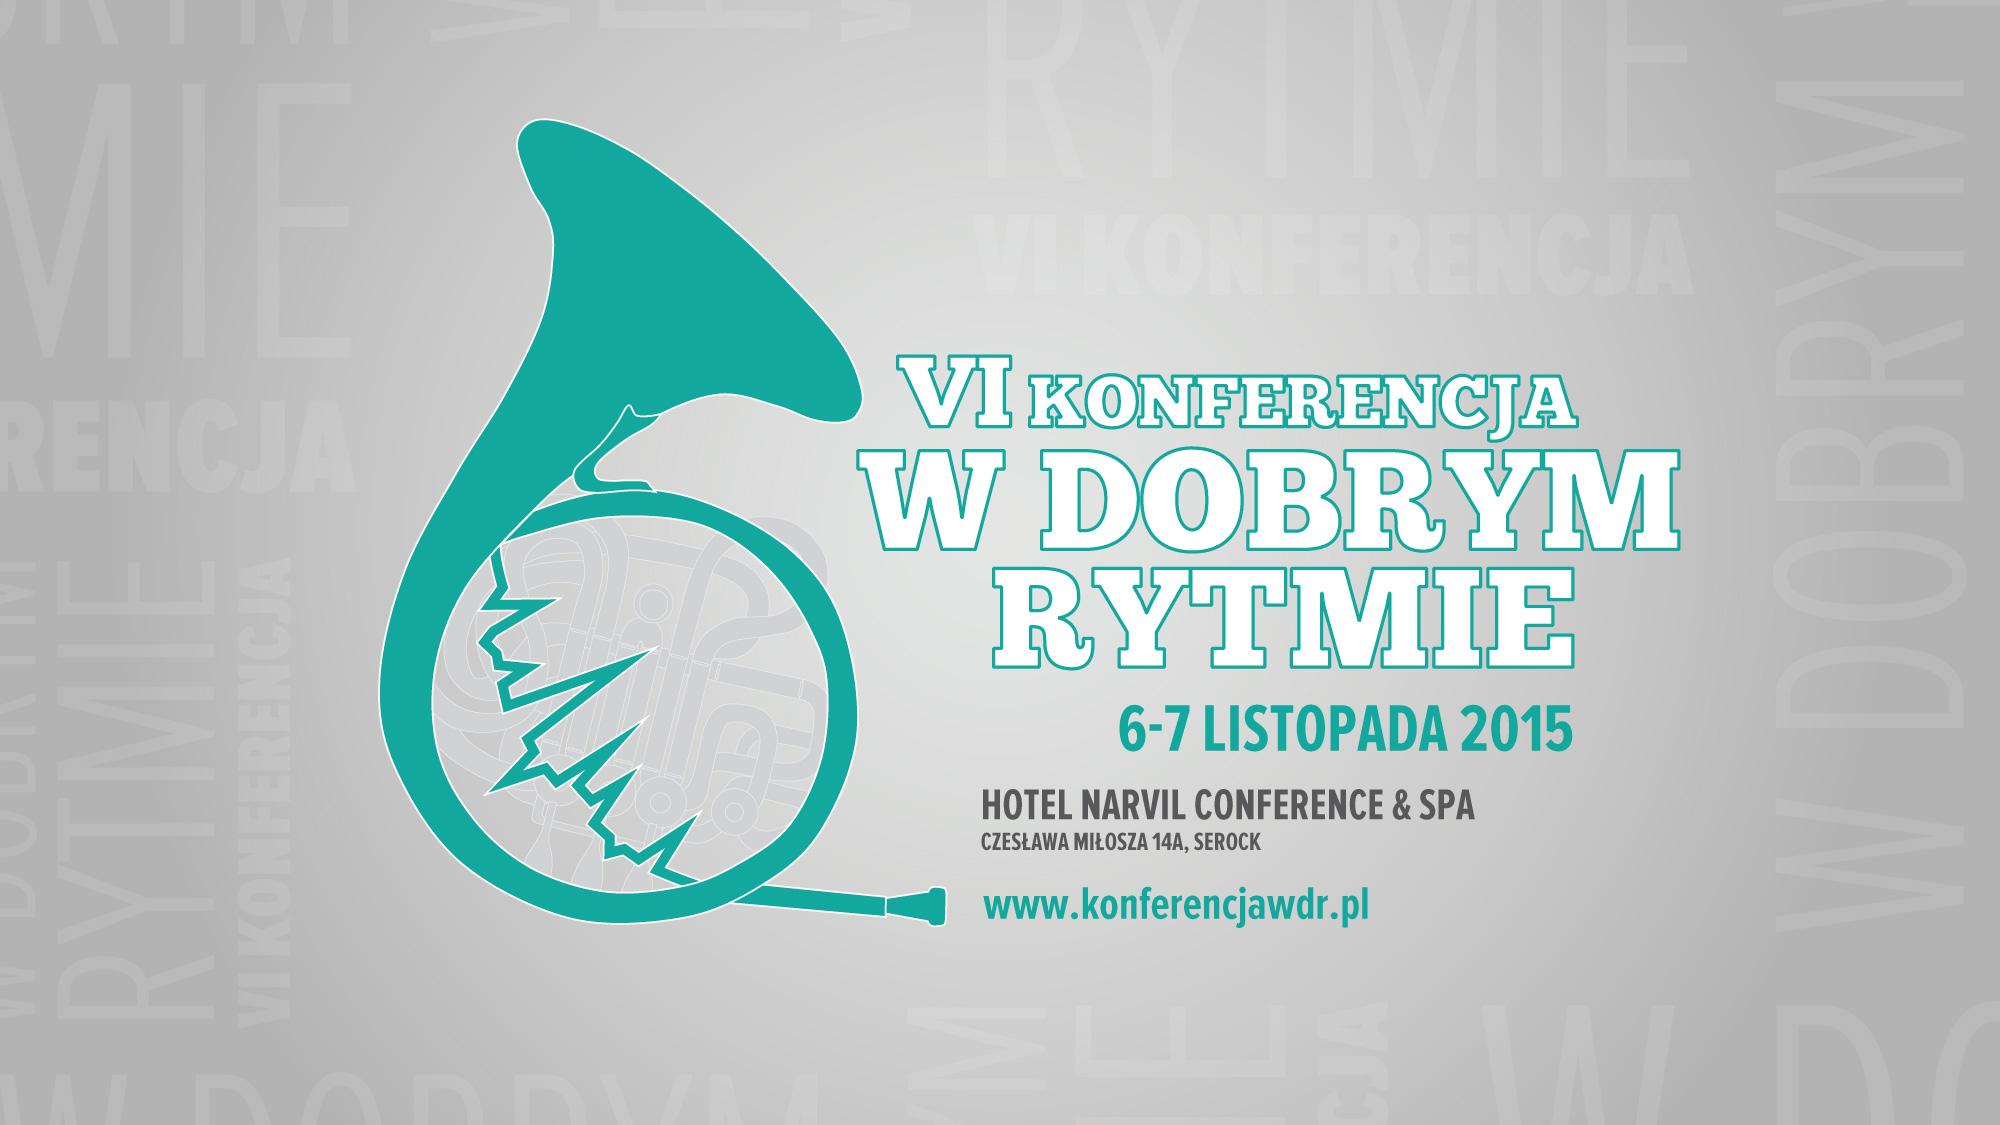 VIkonferencjaWDR